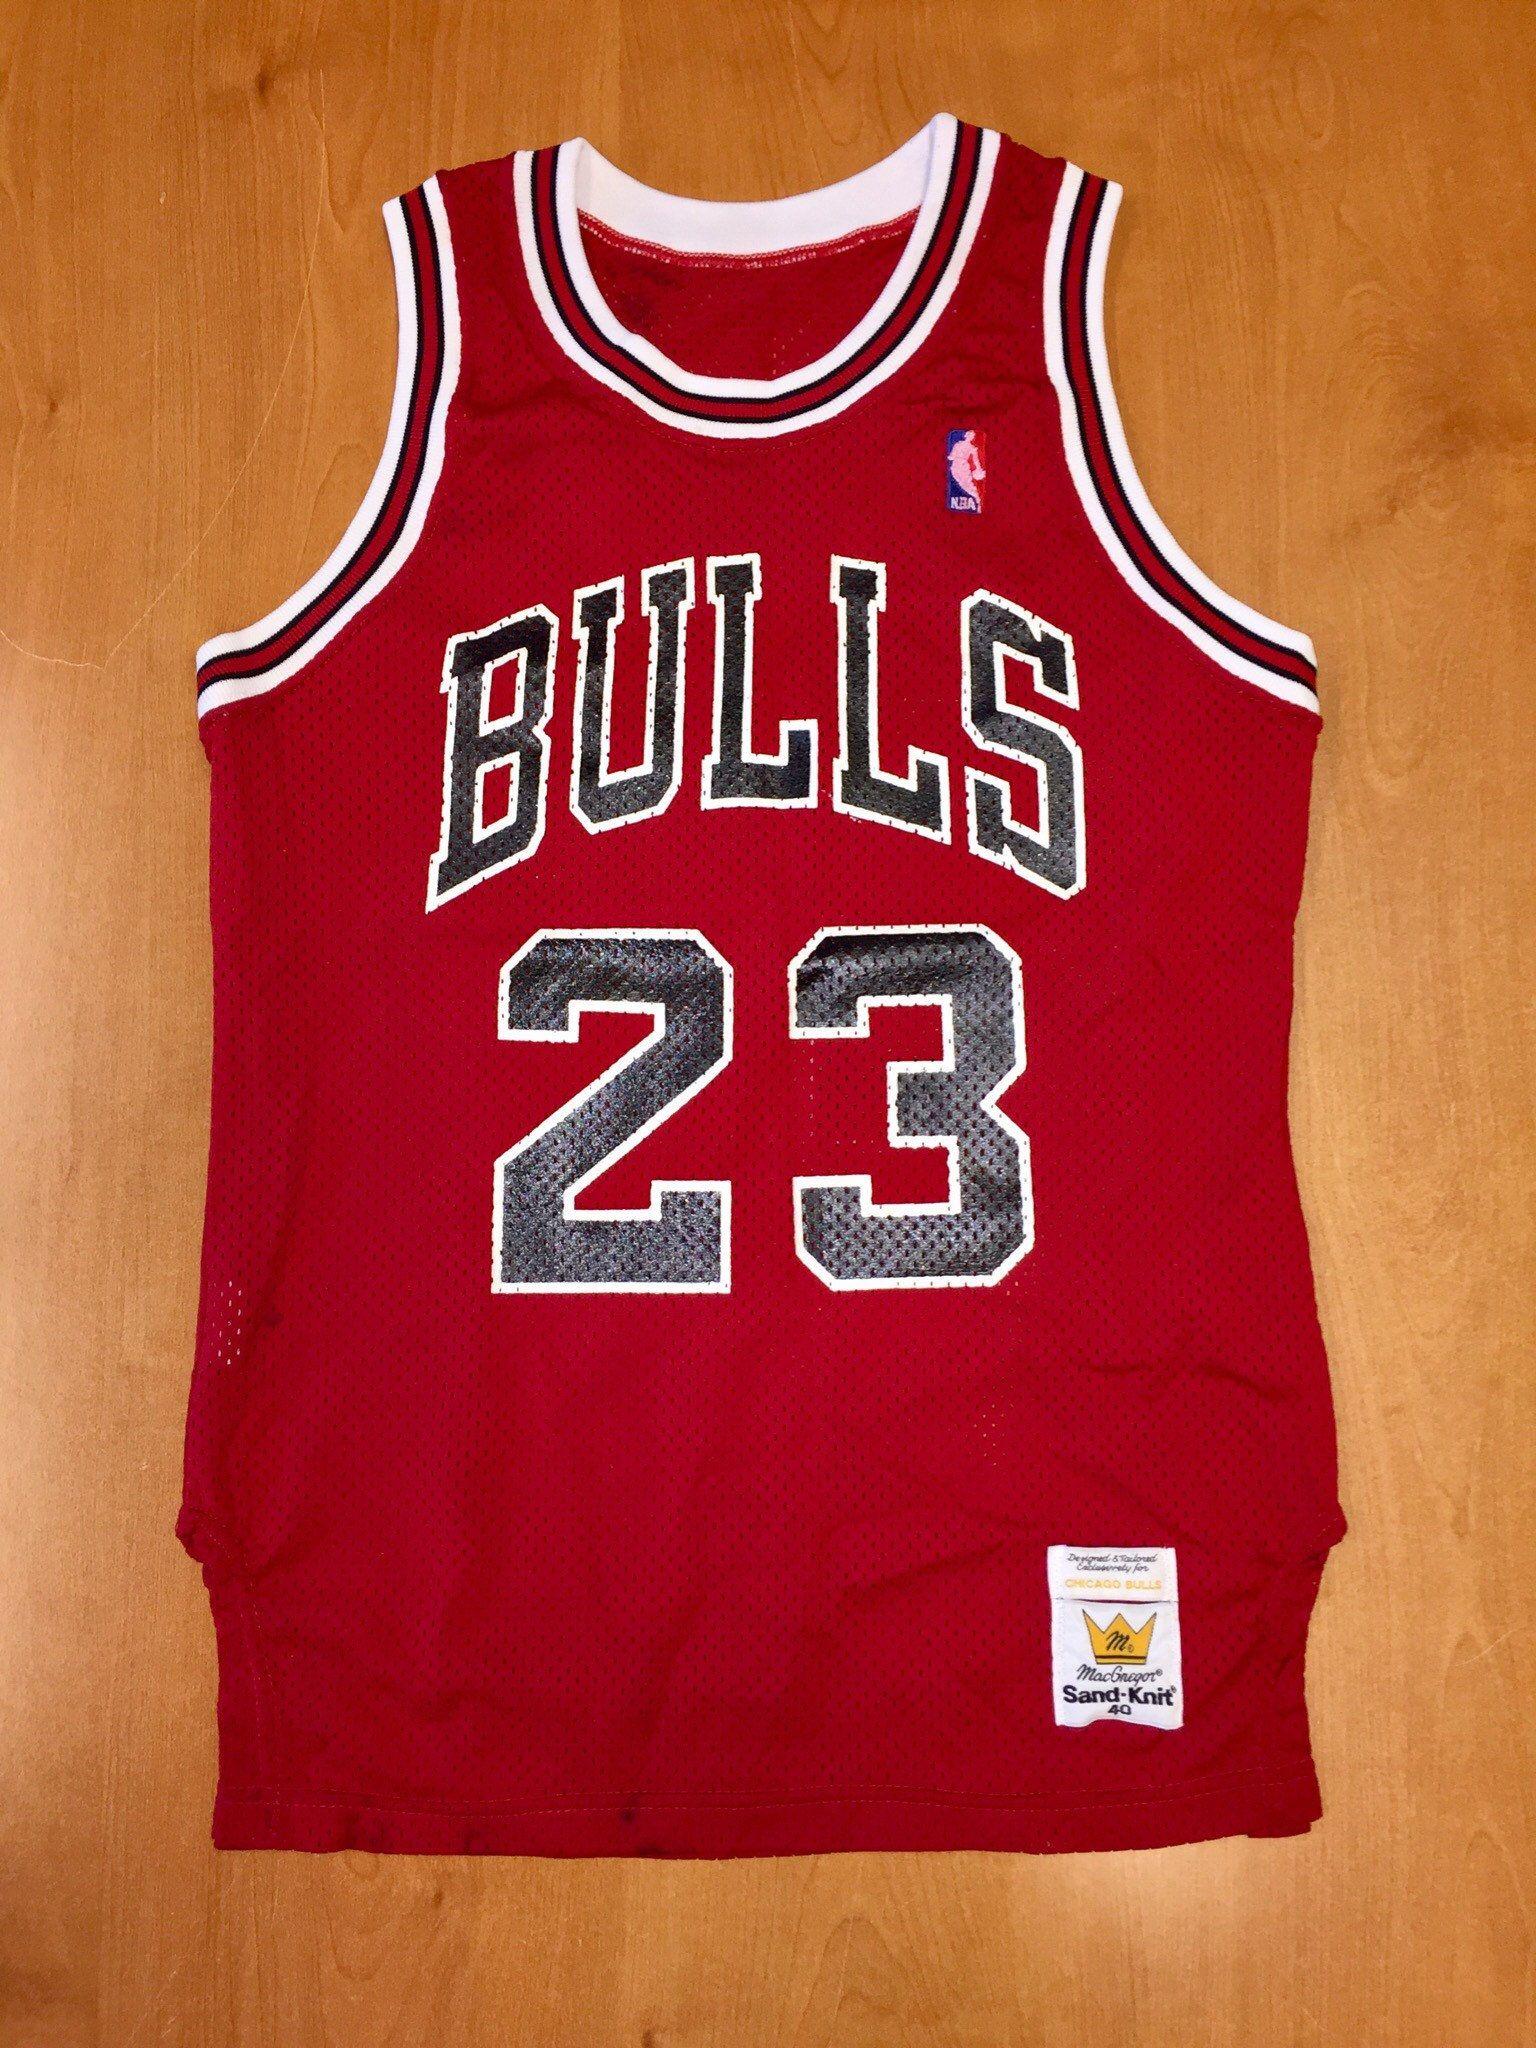 Vintage 1980s Michael Jordan Chicago Bulls Authentic Sand Knit Jersey Size 40 Nba Finals Shirt Chicago Bulls Outfit Michael Jordan Chicago Bulls Michael Jordan